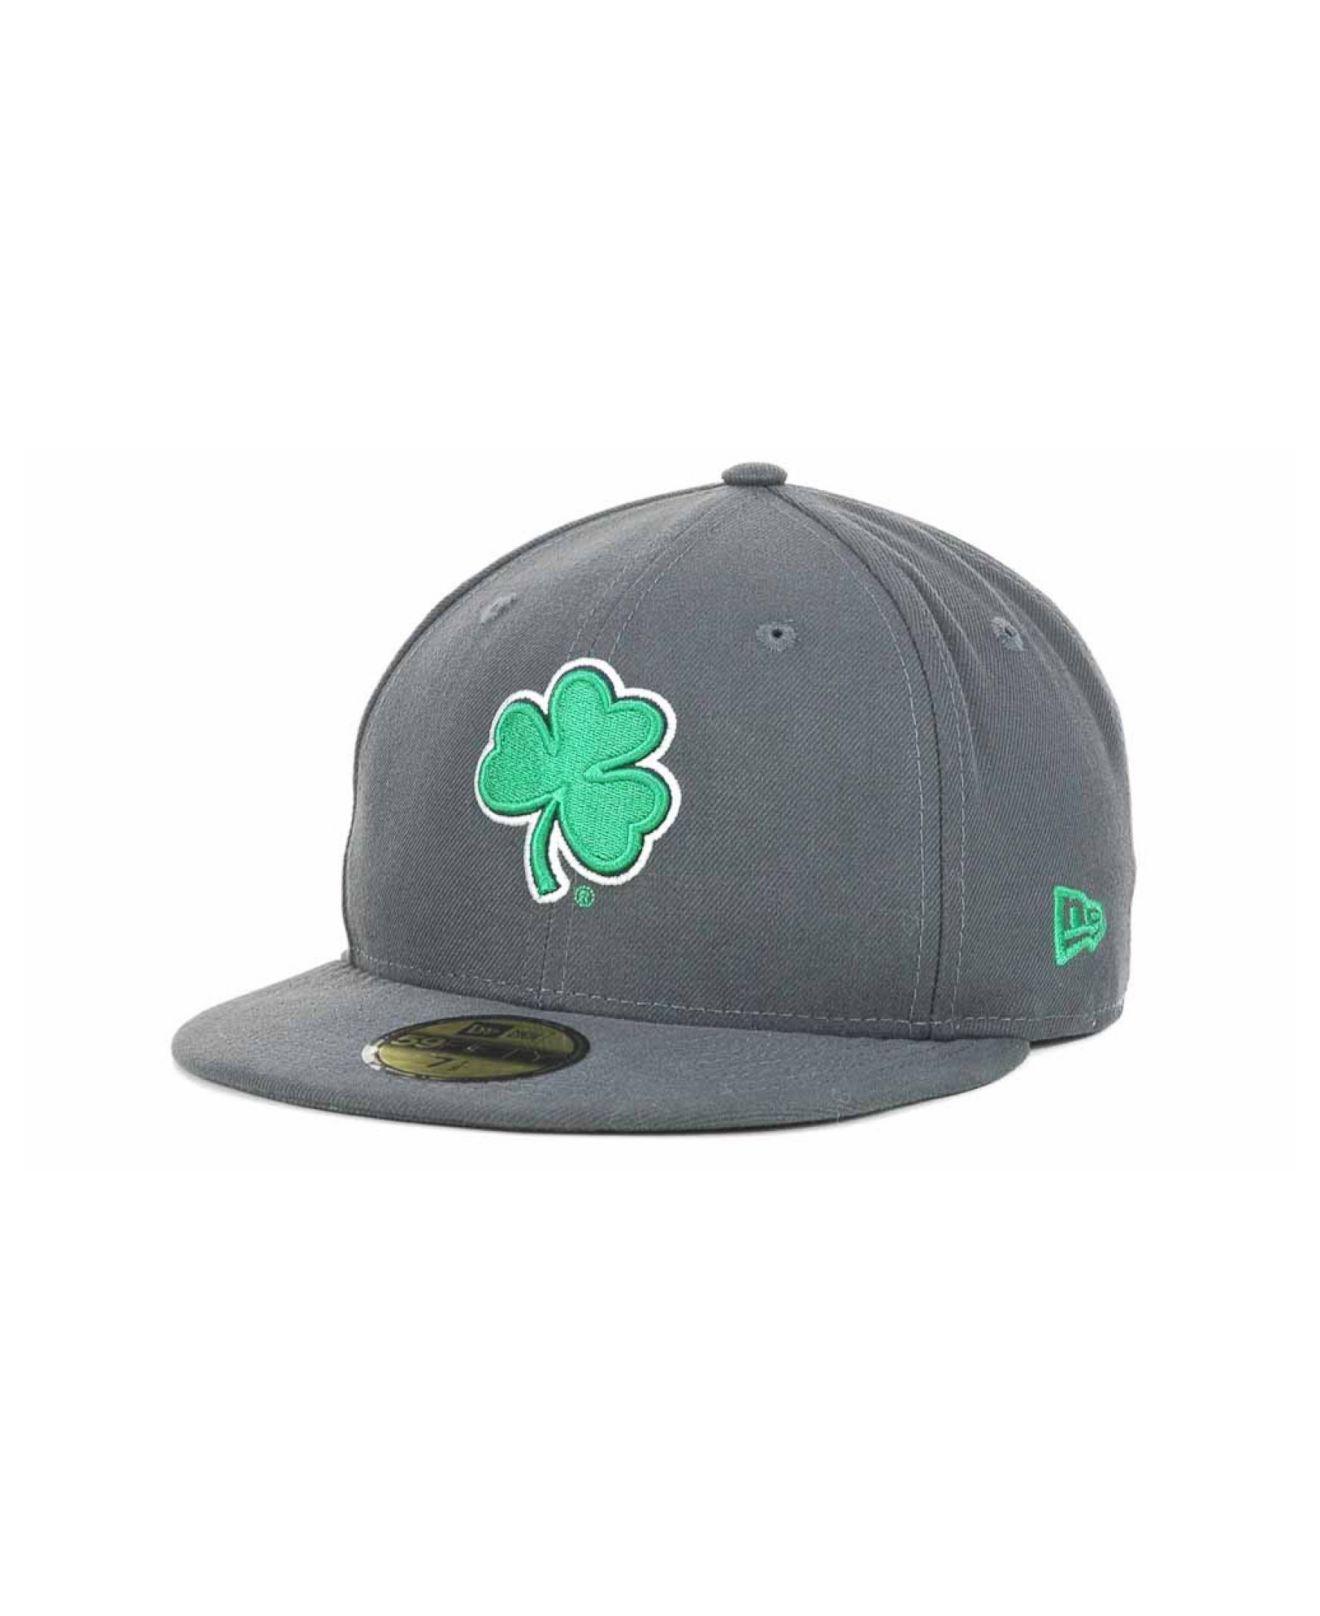 sale retailer 3c757 6268a Lyst - KTZ Notre Dame Fighting Irish Ncaa Ac 59fifty Cap in Gray for Men